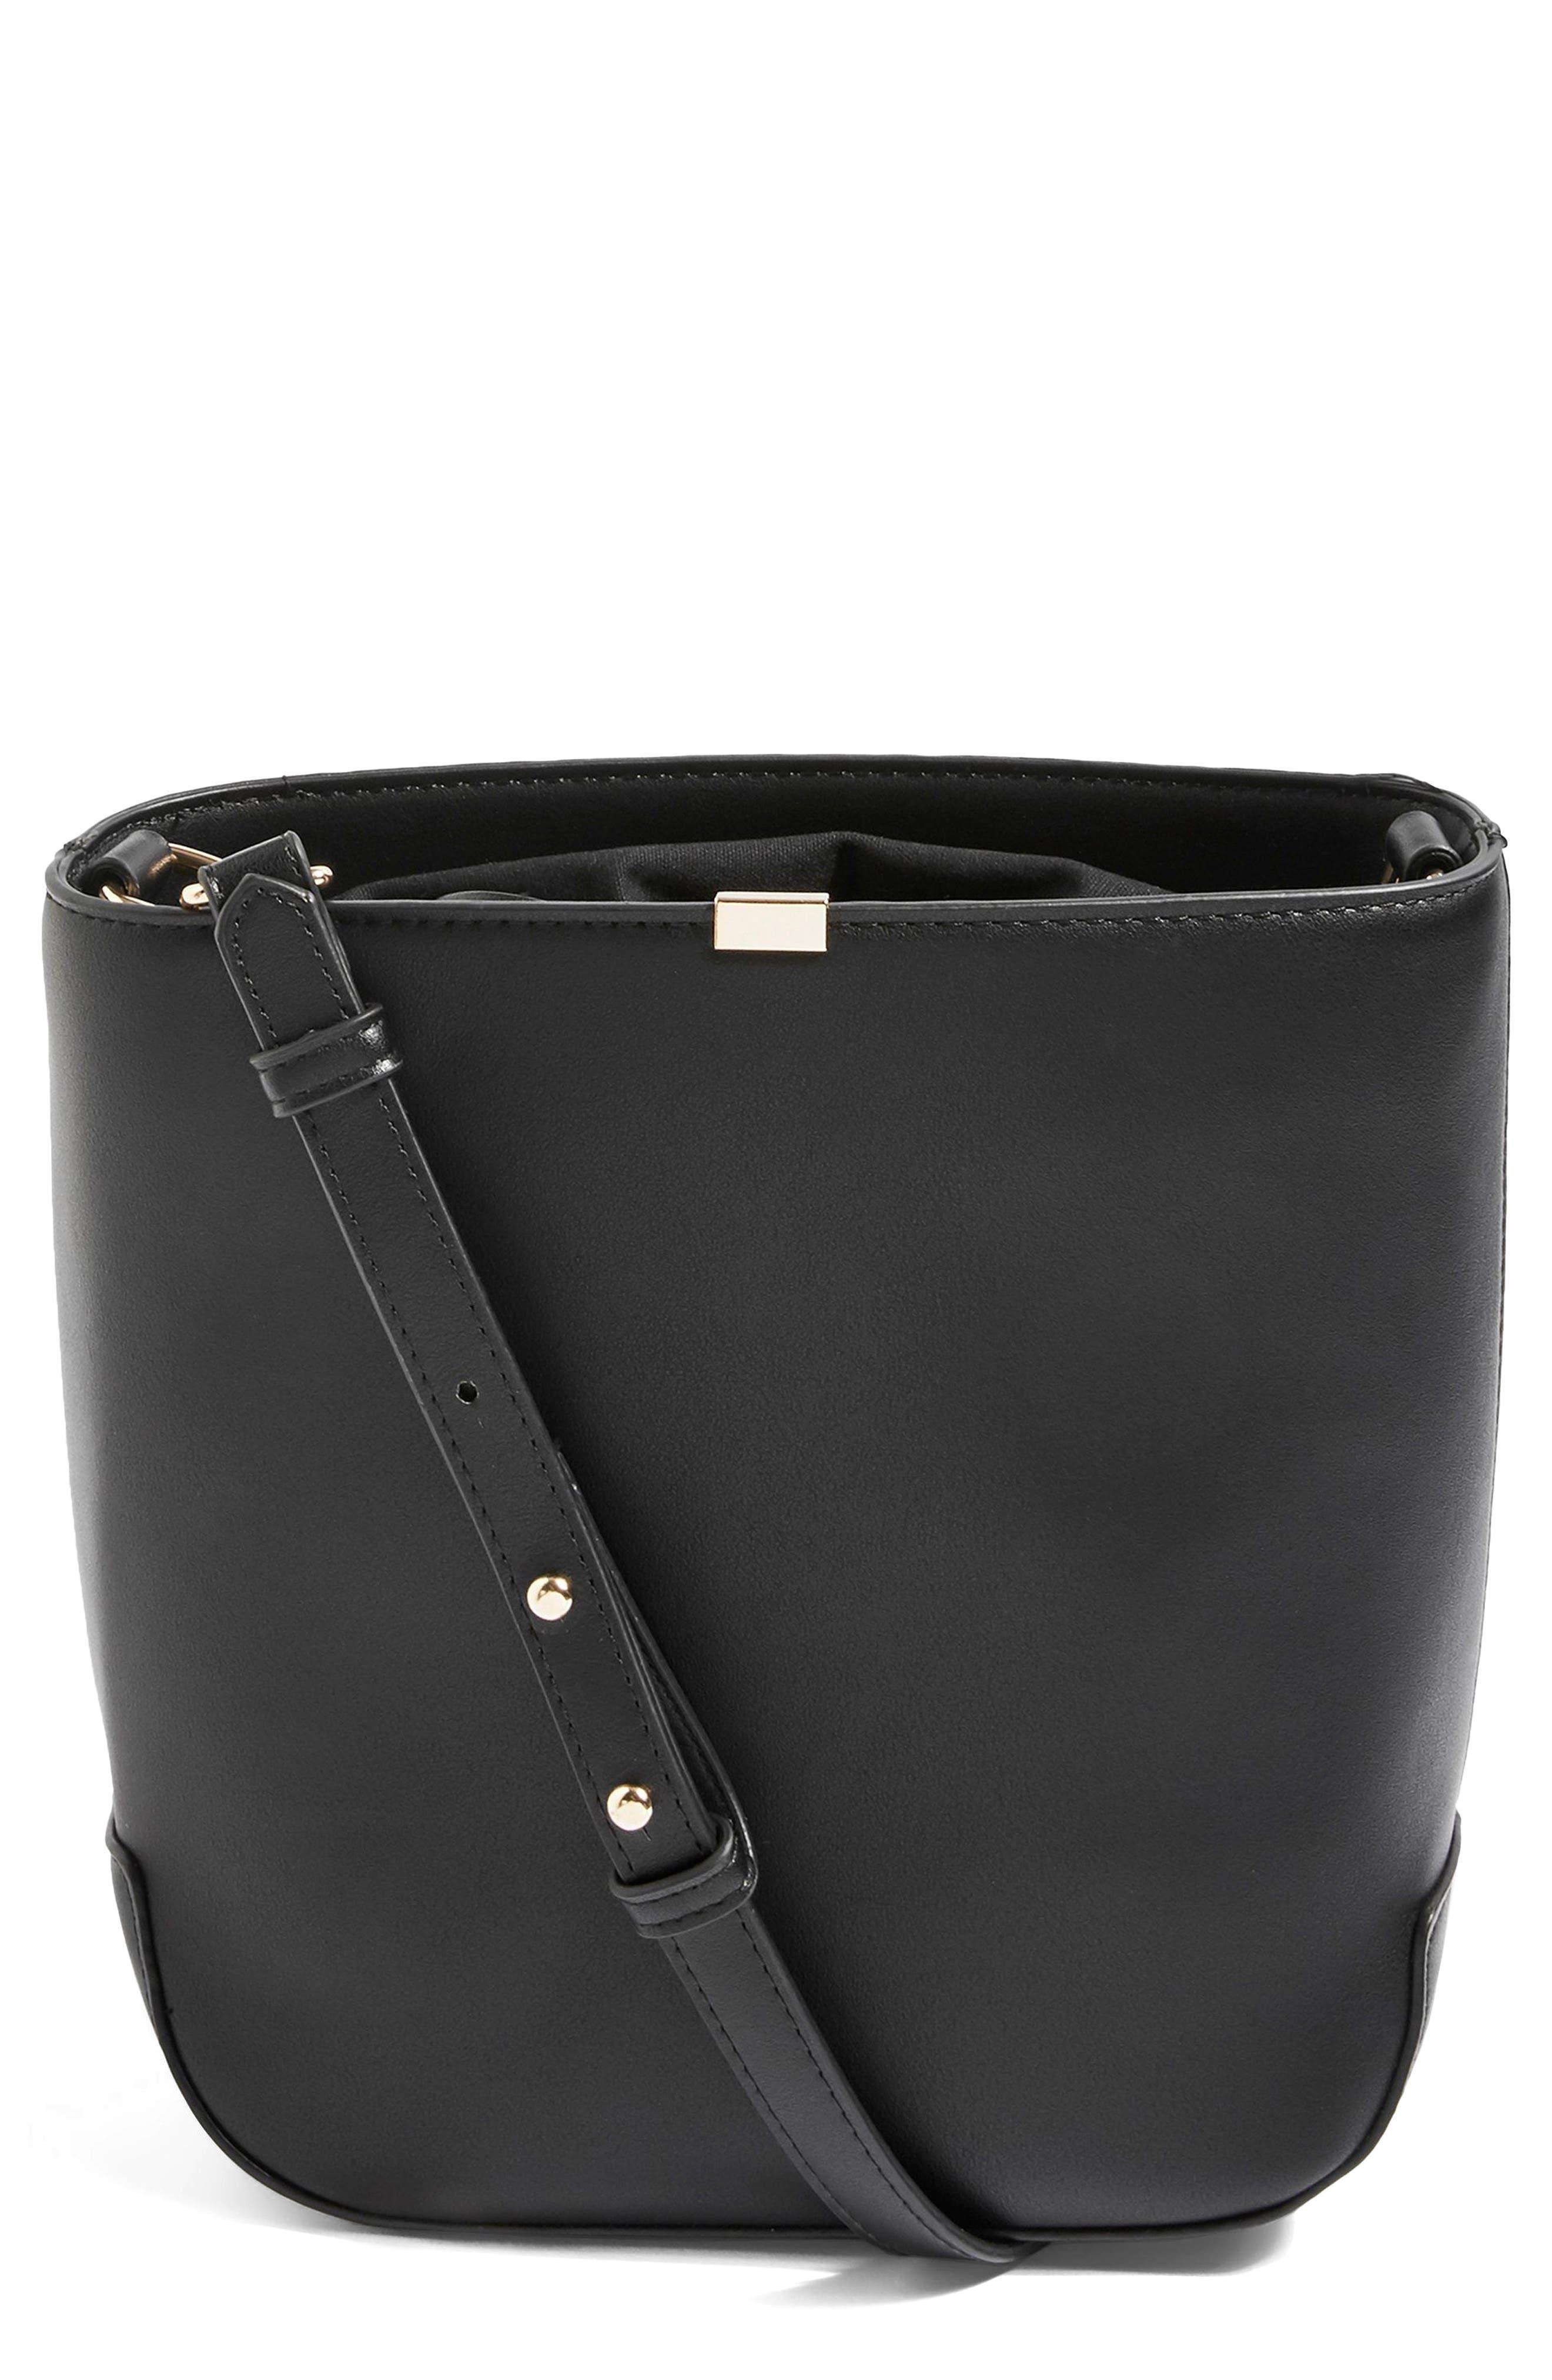 Romy Bucket Shoulder Handbag,                             Main thumbnail 1, color,                             001